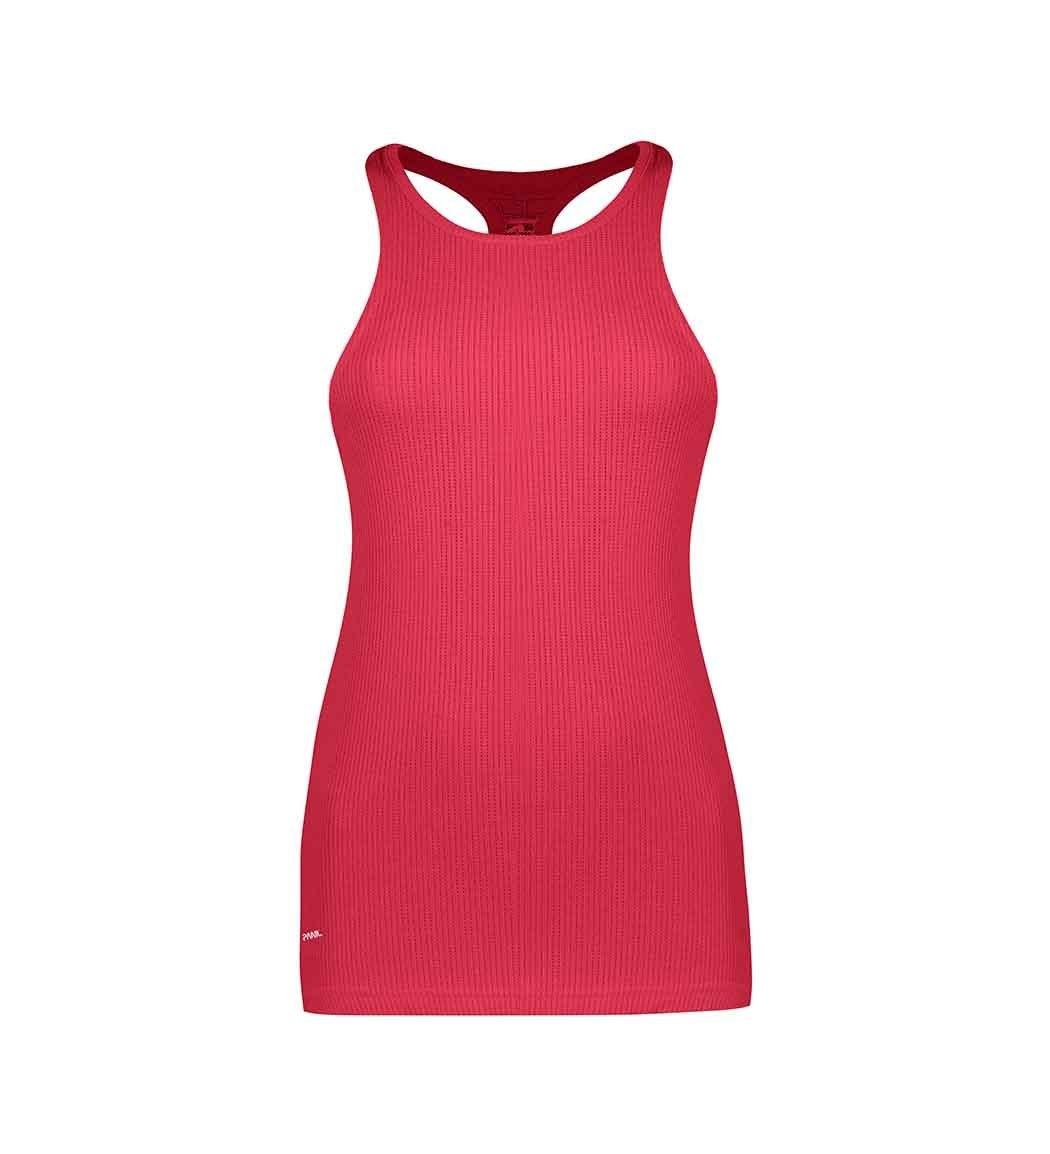 تصویر تاپ ورزشی زنانه رنگ سرخابی کد 4059پانیل Panil Top For Women